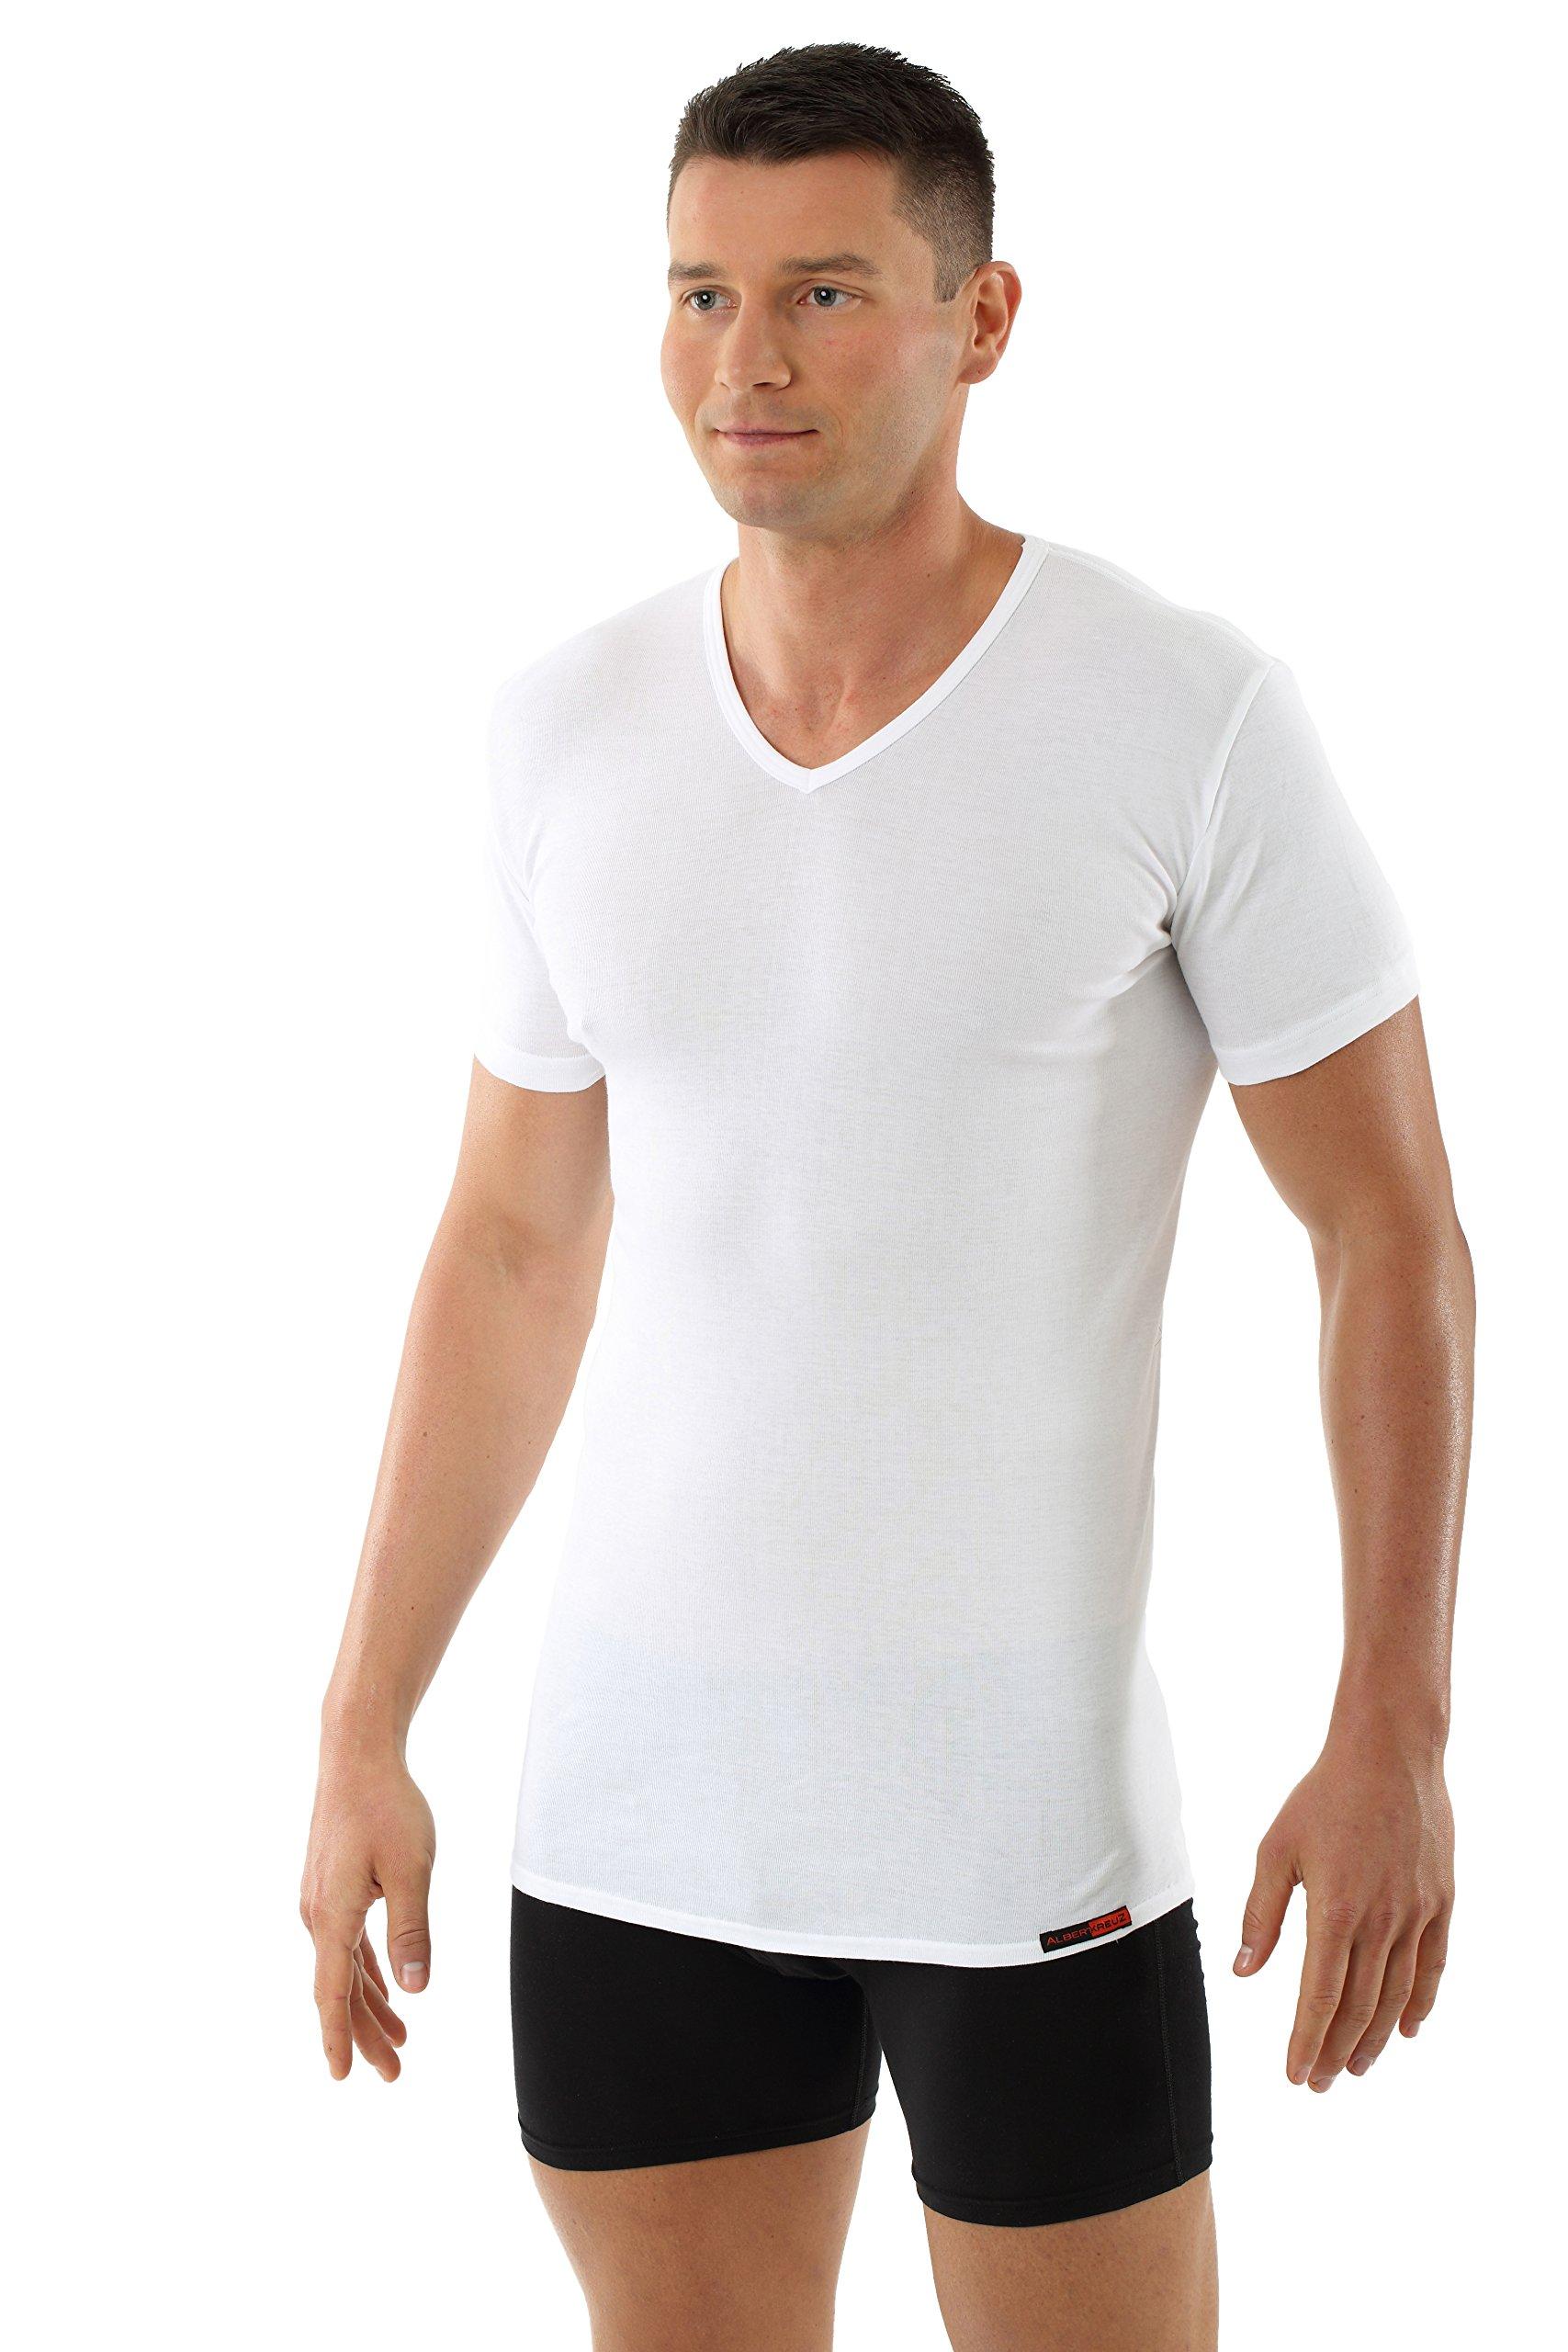 ALBERT KREUZ men's V-neck business undershirt with short sleeves 100% organic cotton white M